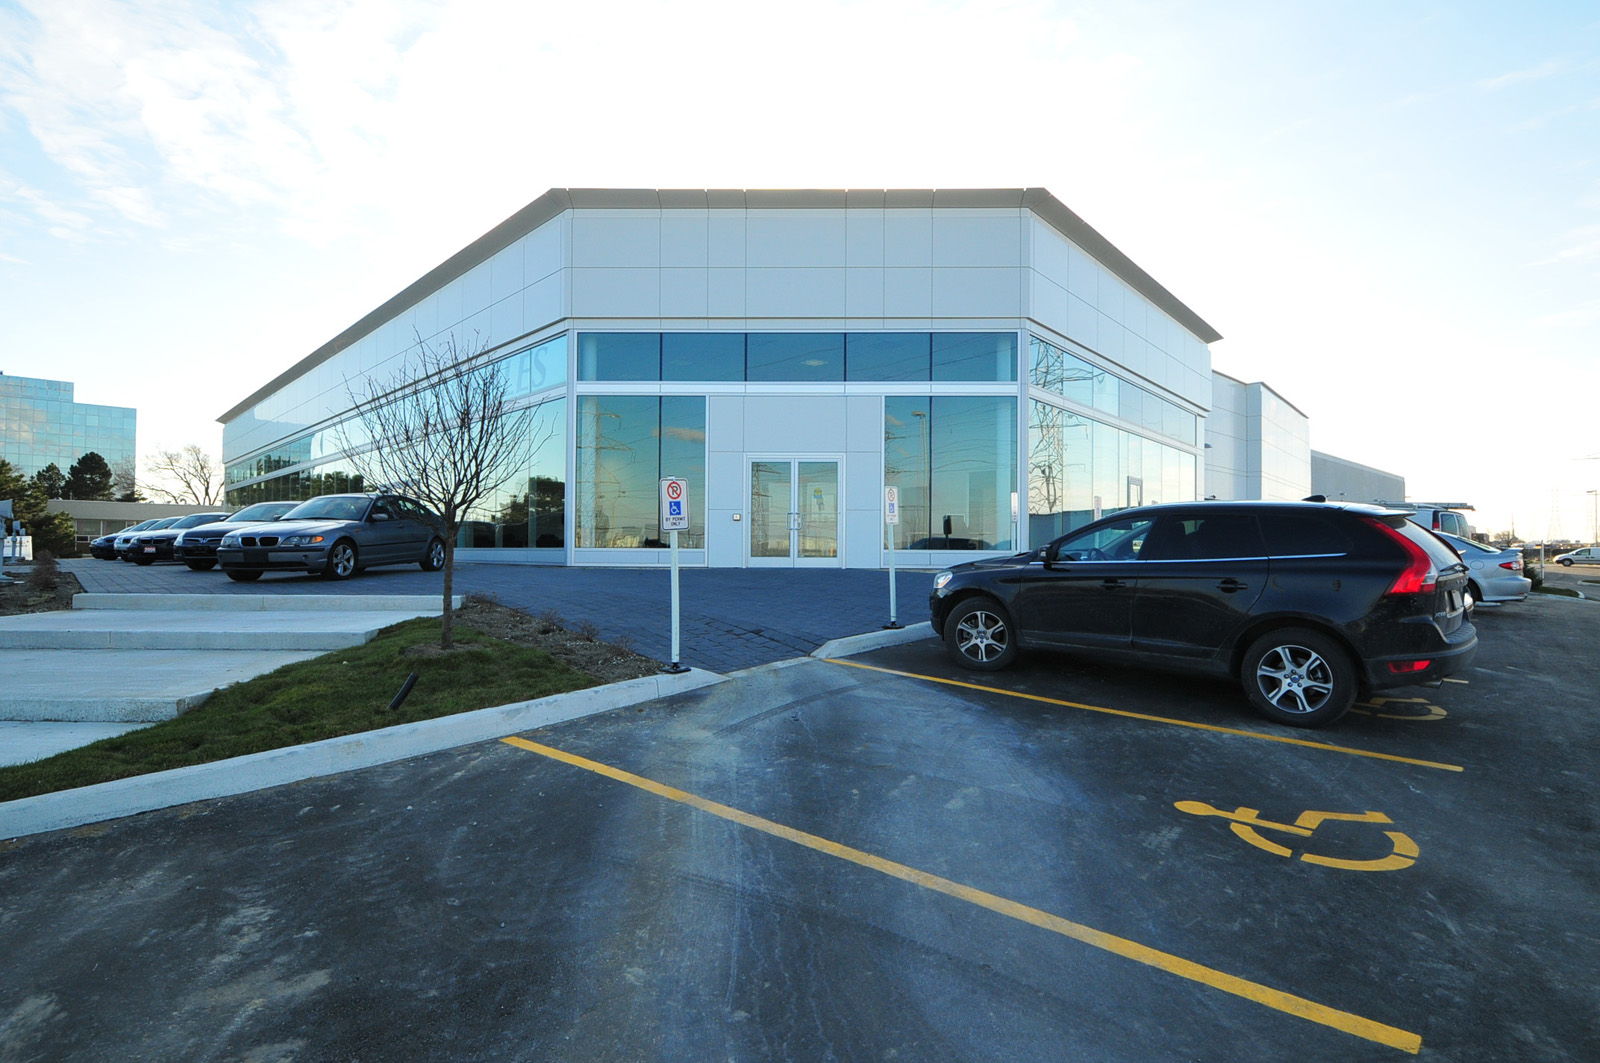 Auto World Dealership and Body Shop Facility